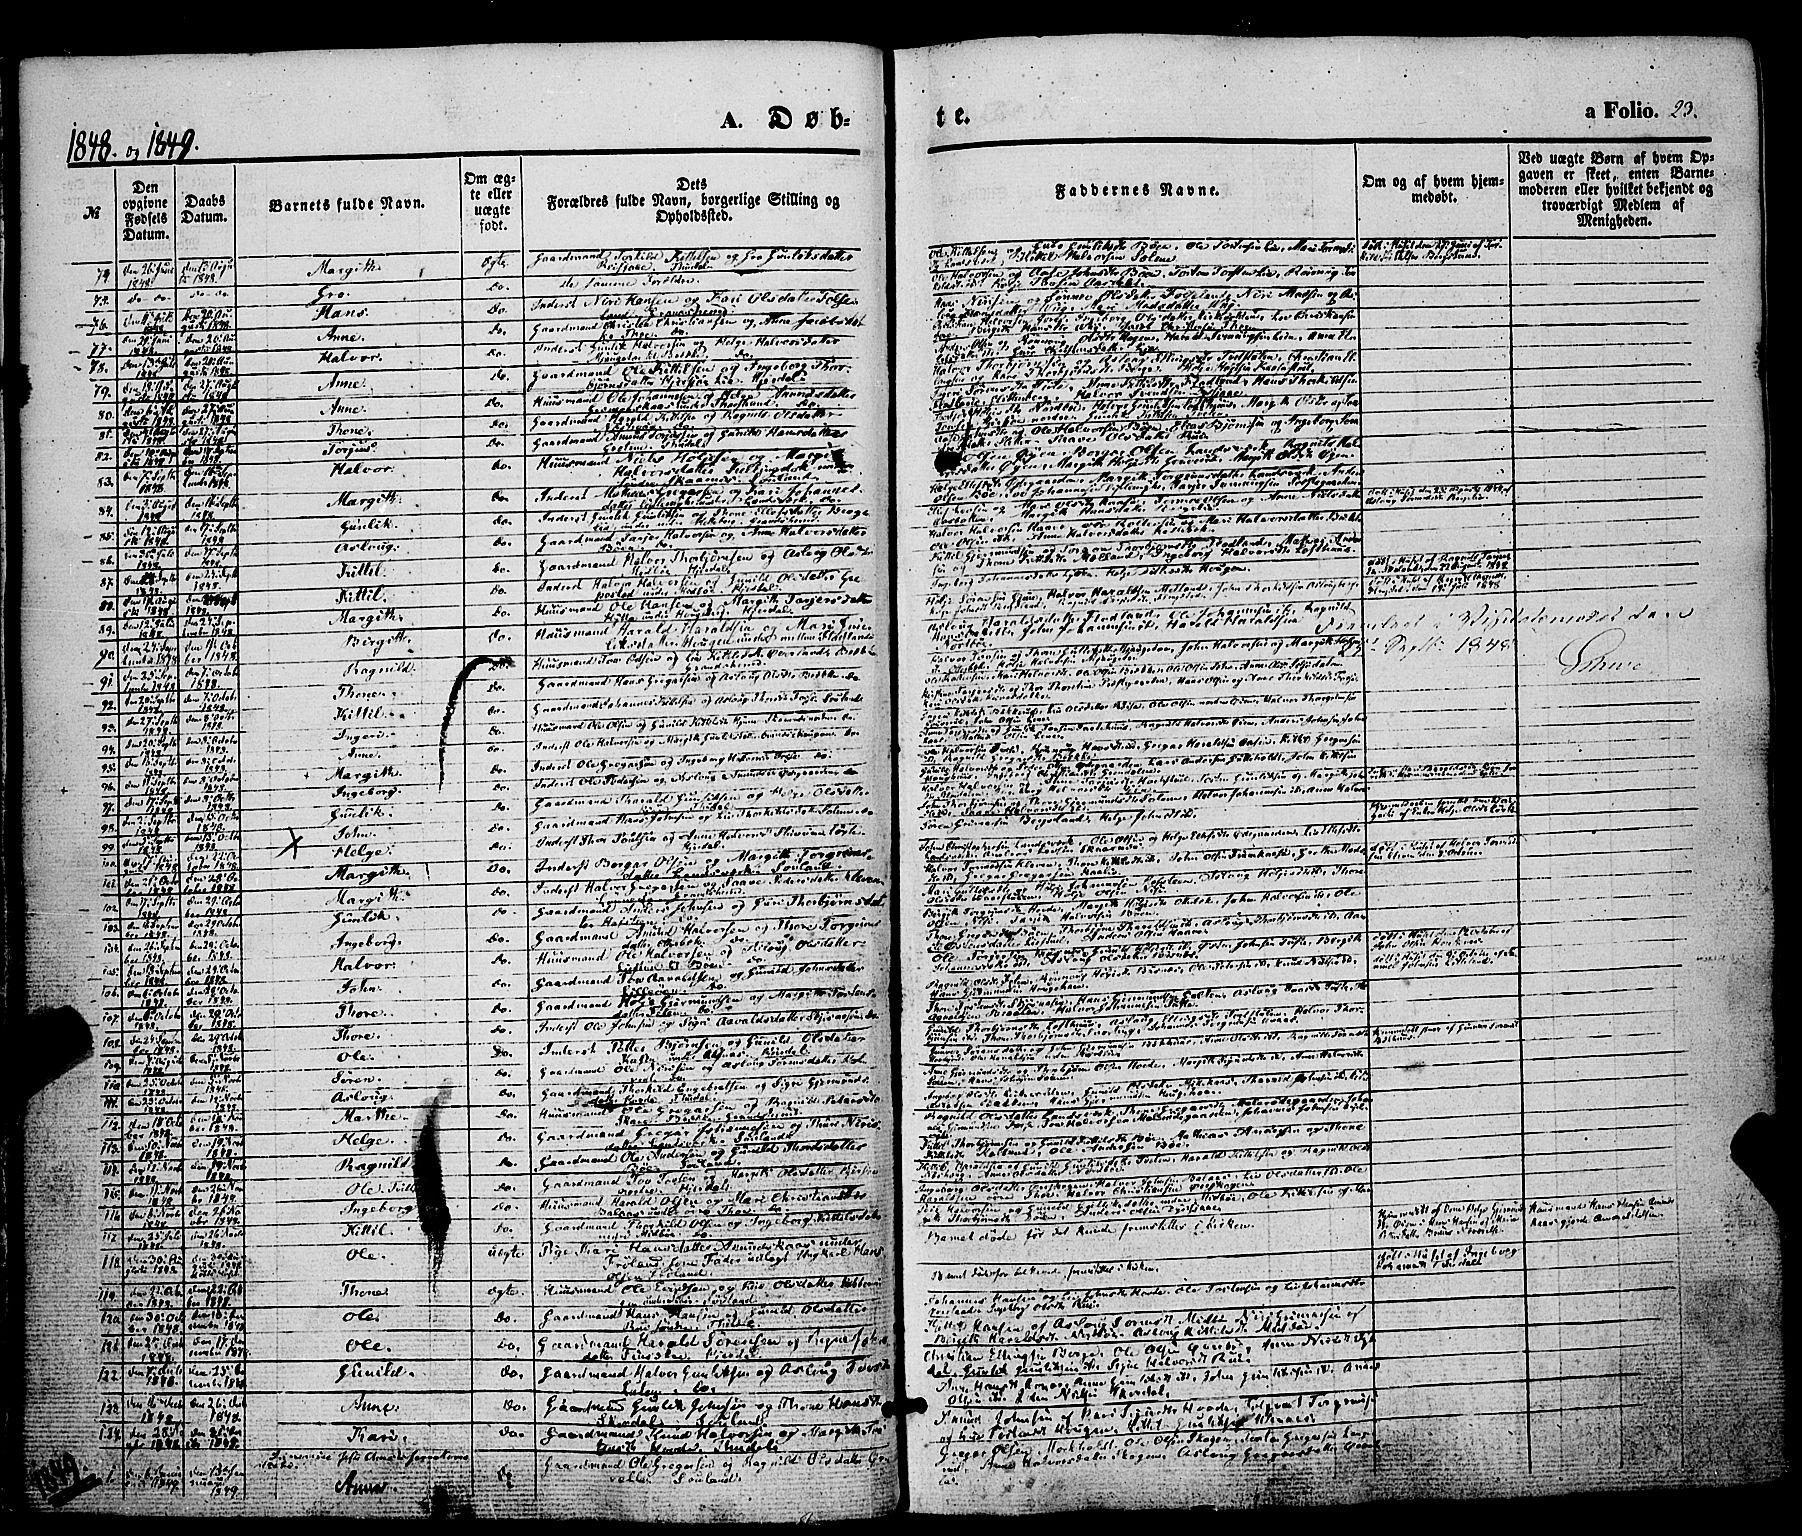 SAKO, Hjartdal kirkebøker, F/Fa/L0008: Ministerialbok nr. I 8, 1844-1859, s. 23